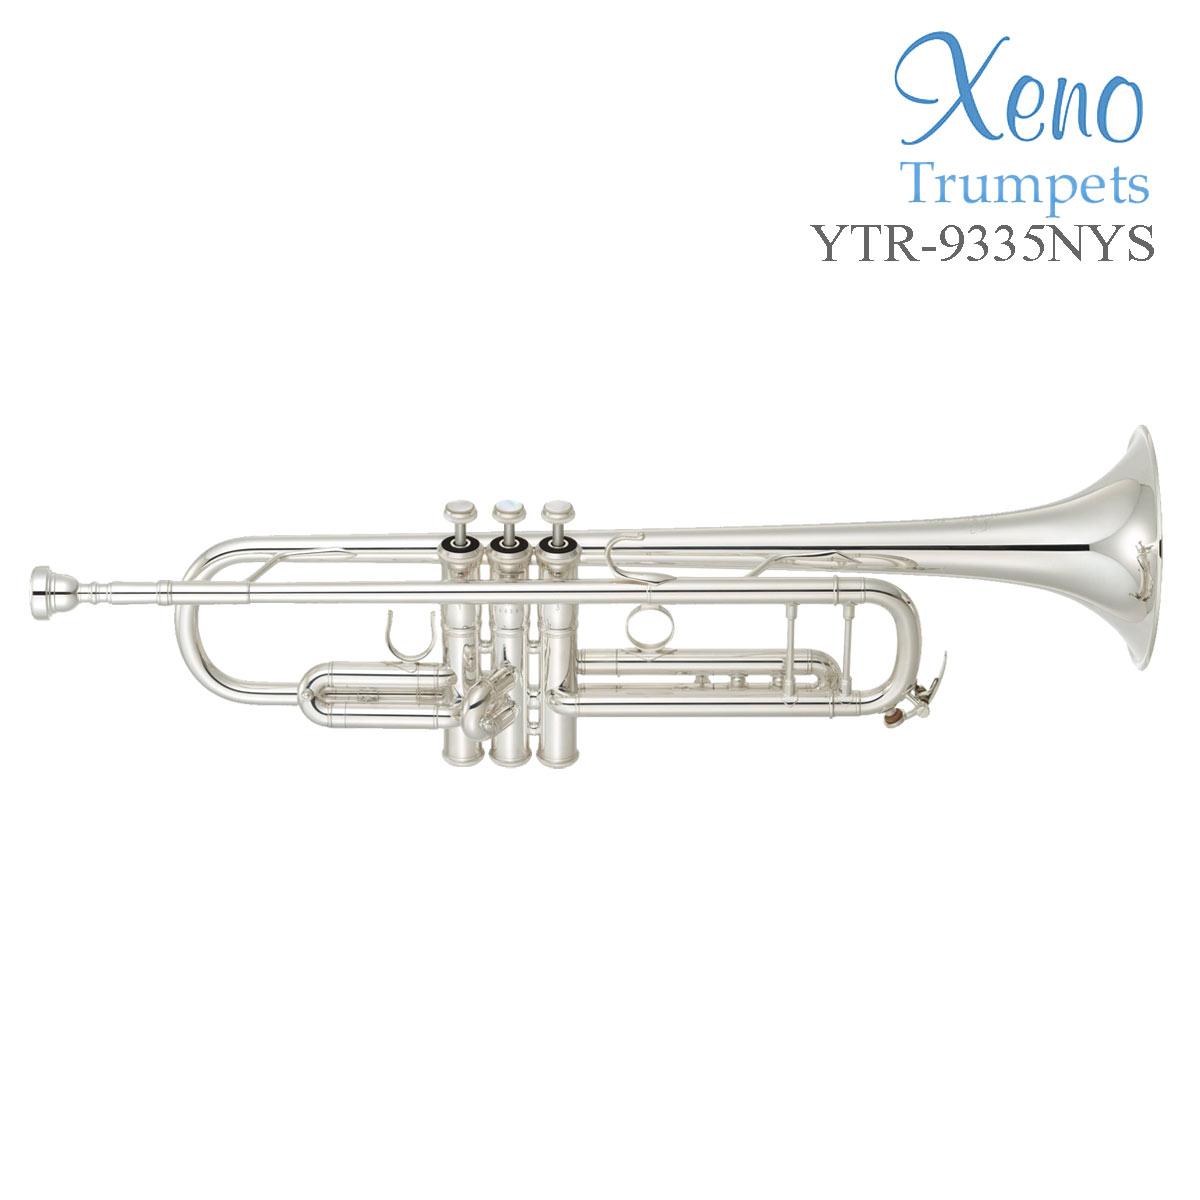 YAMAHA / YTR-9335NYS ヤマハ トランペット Xeno アーティストモデル ニューヨークシリーズ 銀メッキ仕上げ 《出荷前検品》《5年保証》